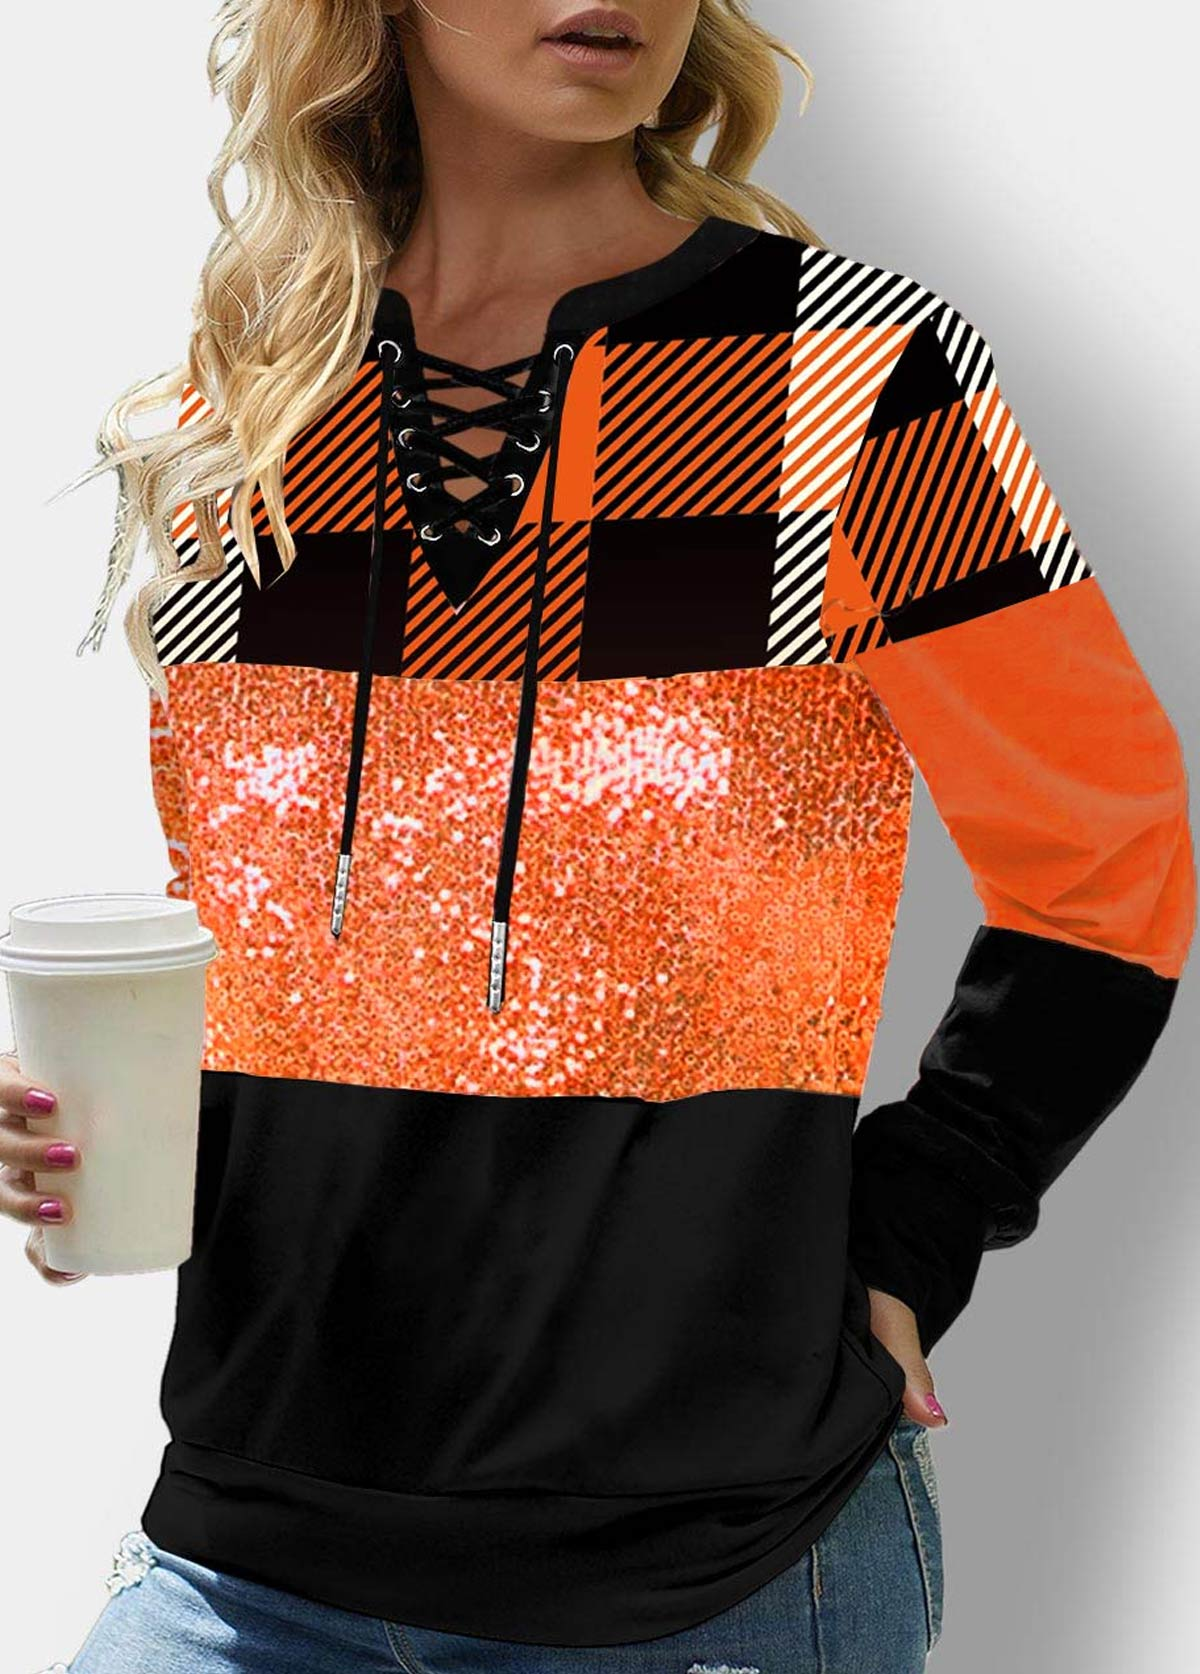 Plaid Orange Lace Up Sequin Sweatshirt